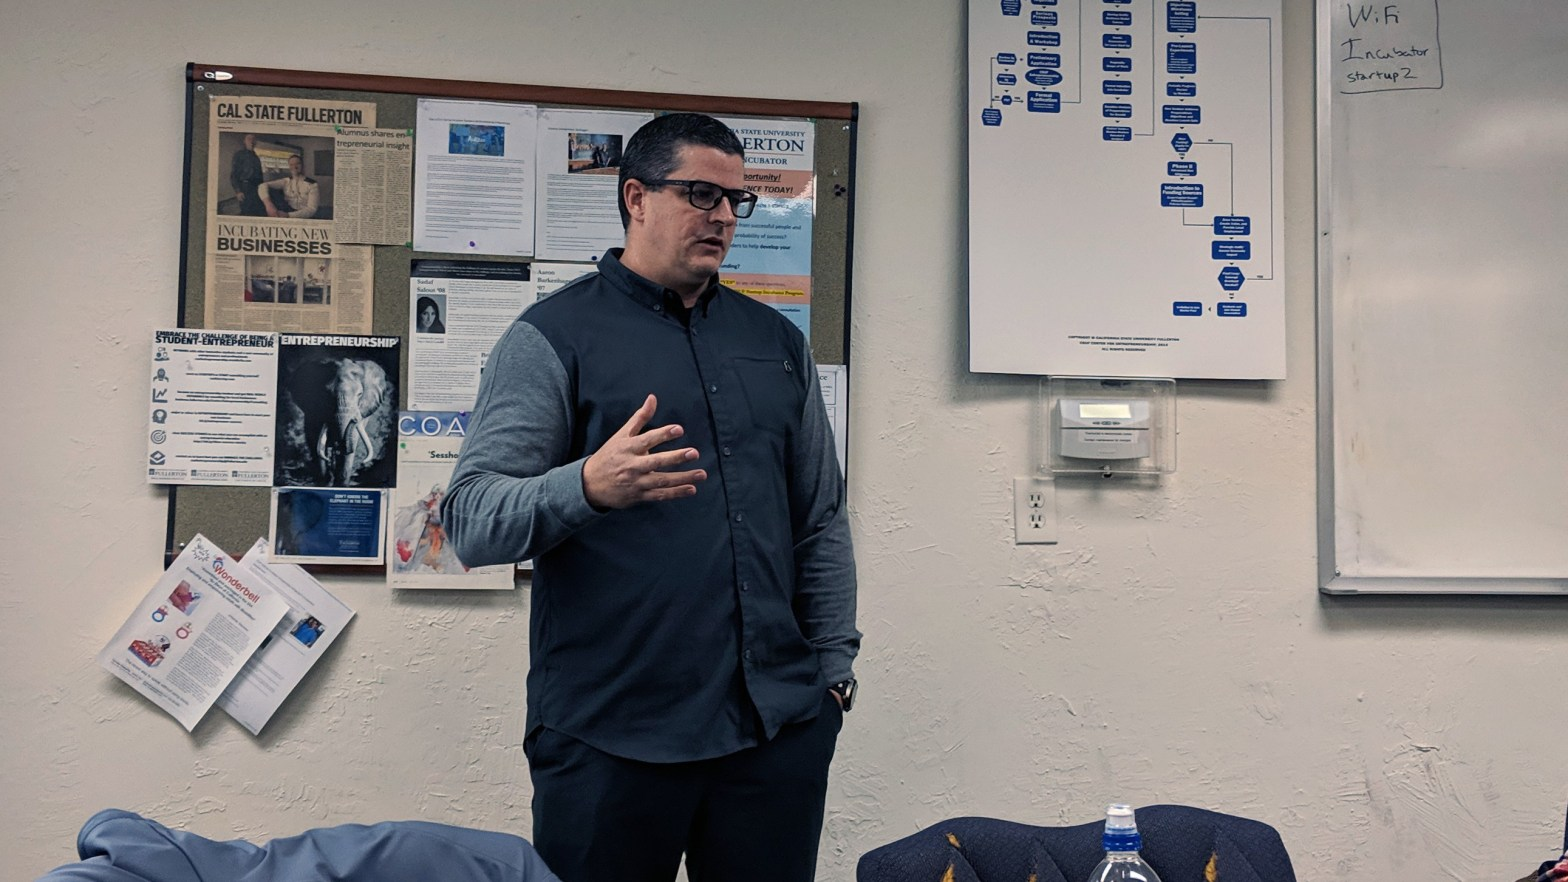 Michael Daehn SEO CSUF Startup Incubator Talk